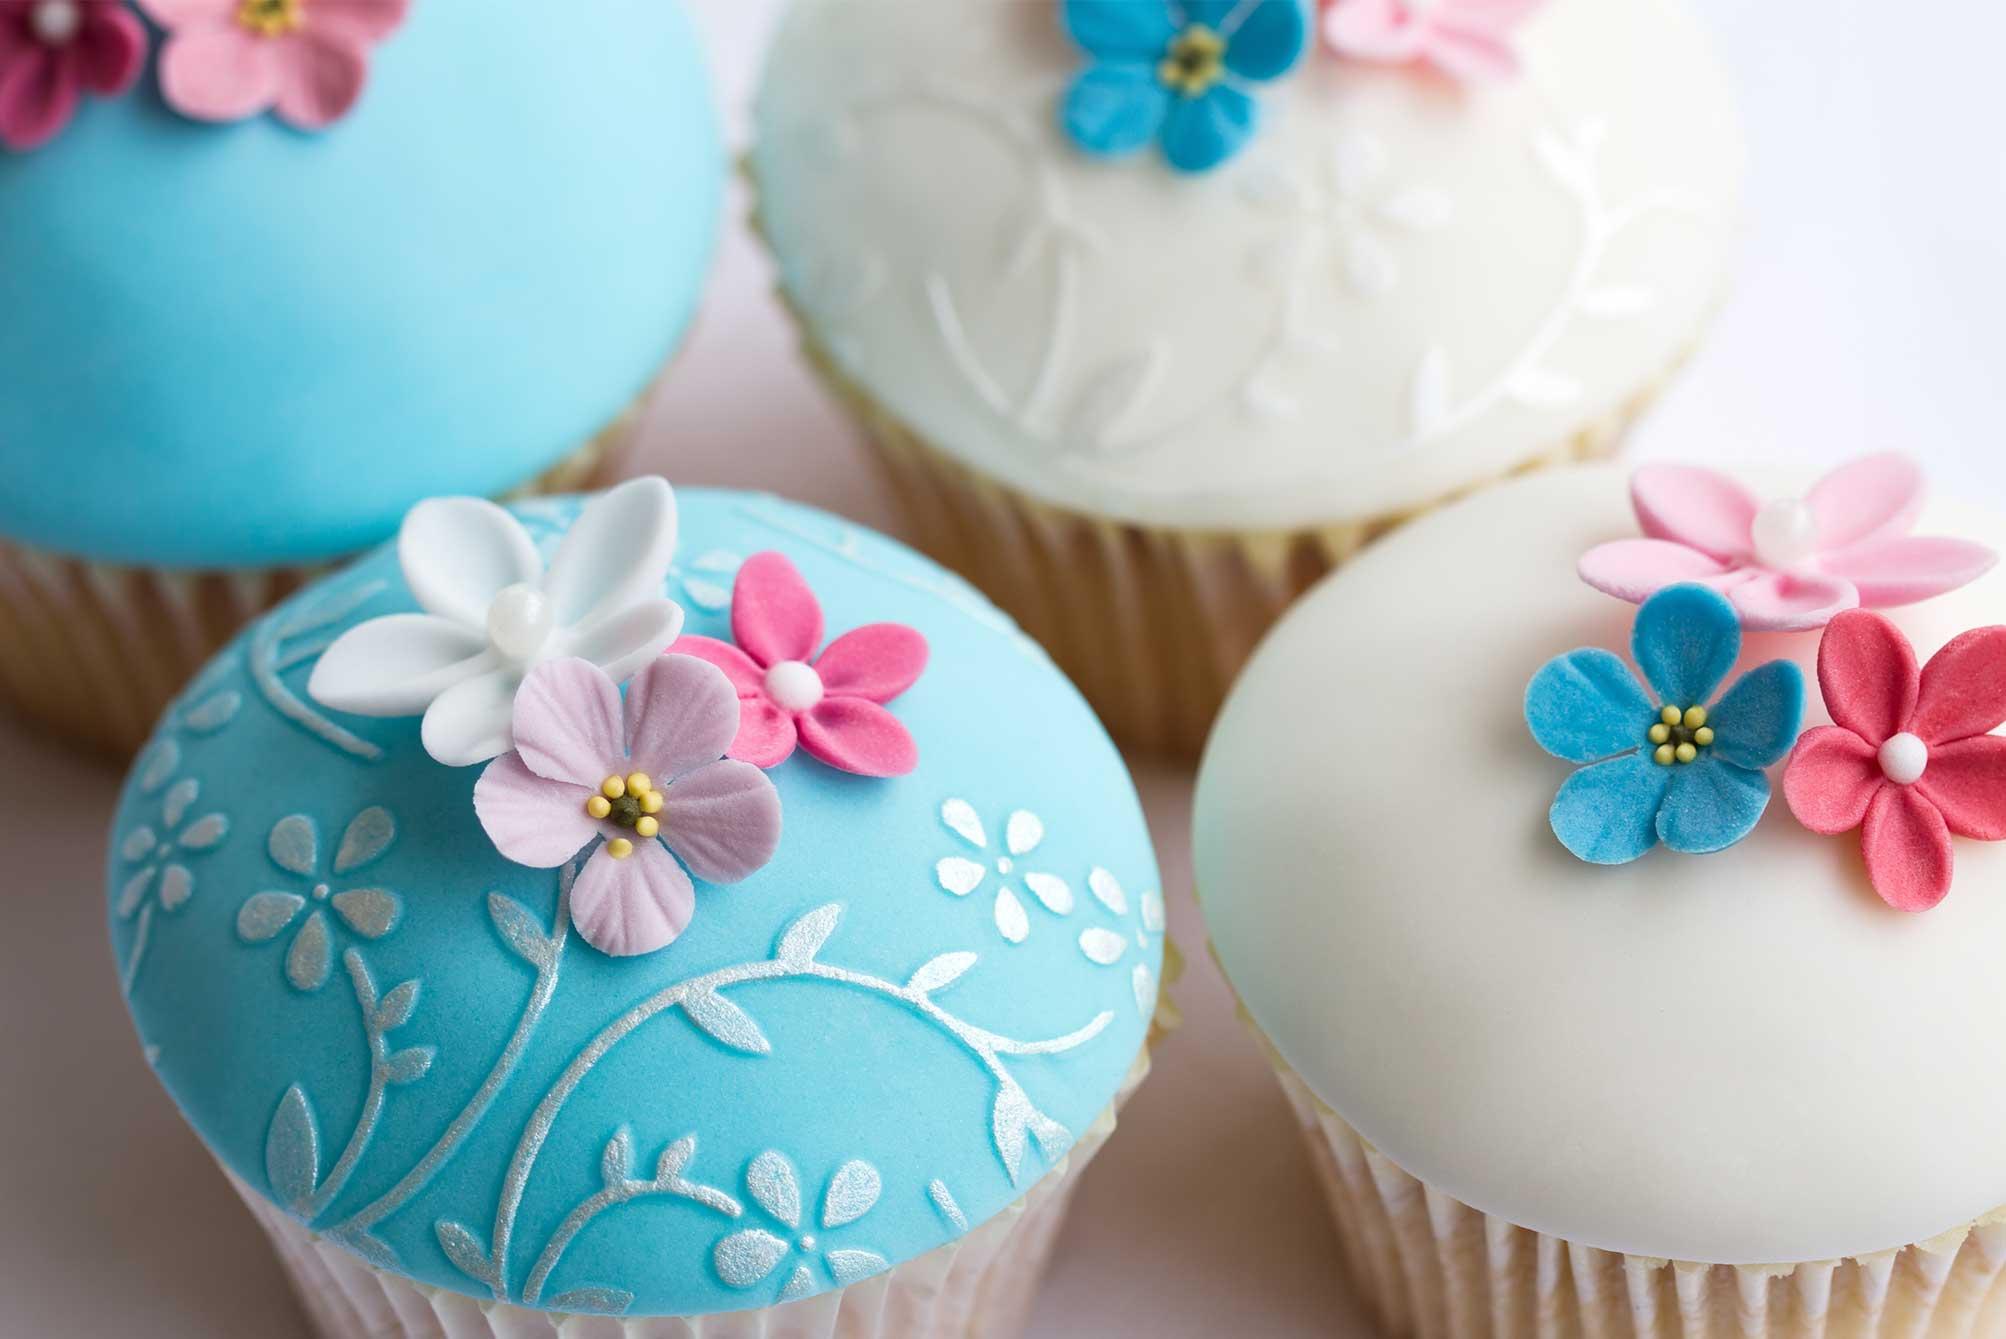 Cake design ideas for Mother\'s Day   Novacart Italia